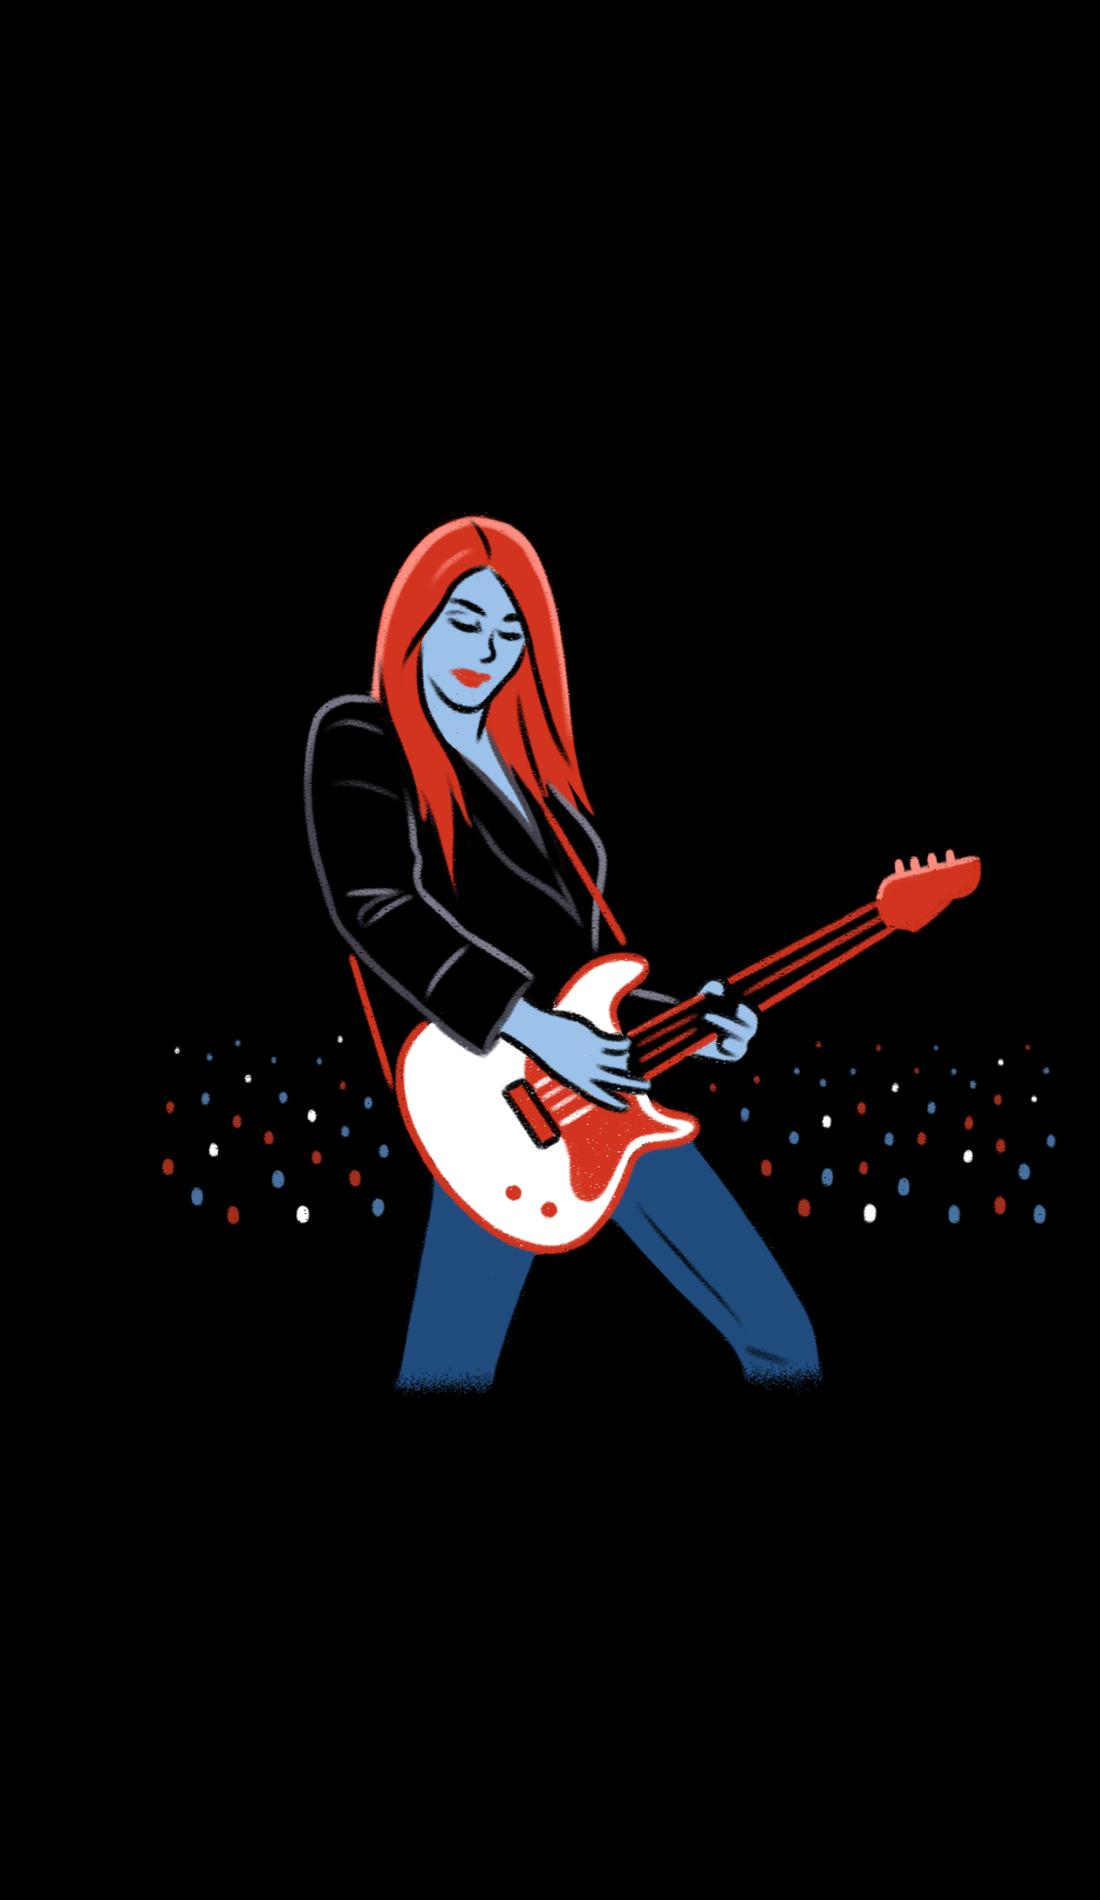 A Movements live event